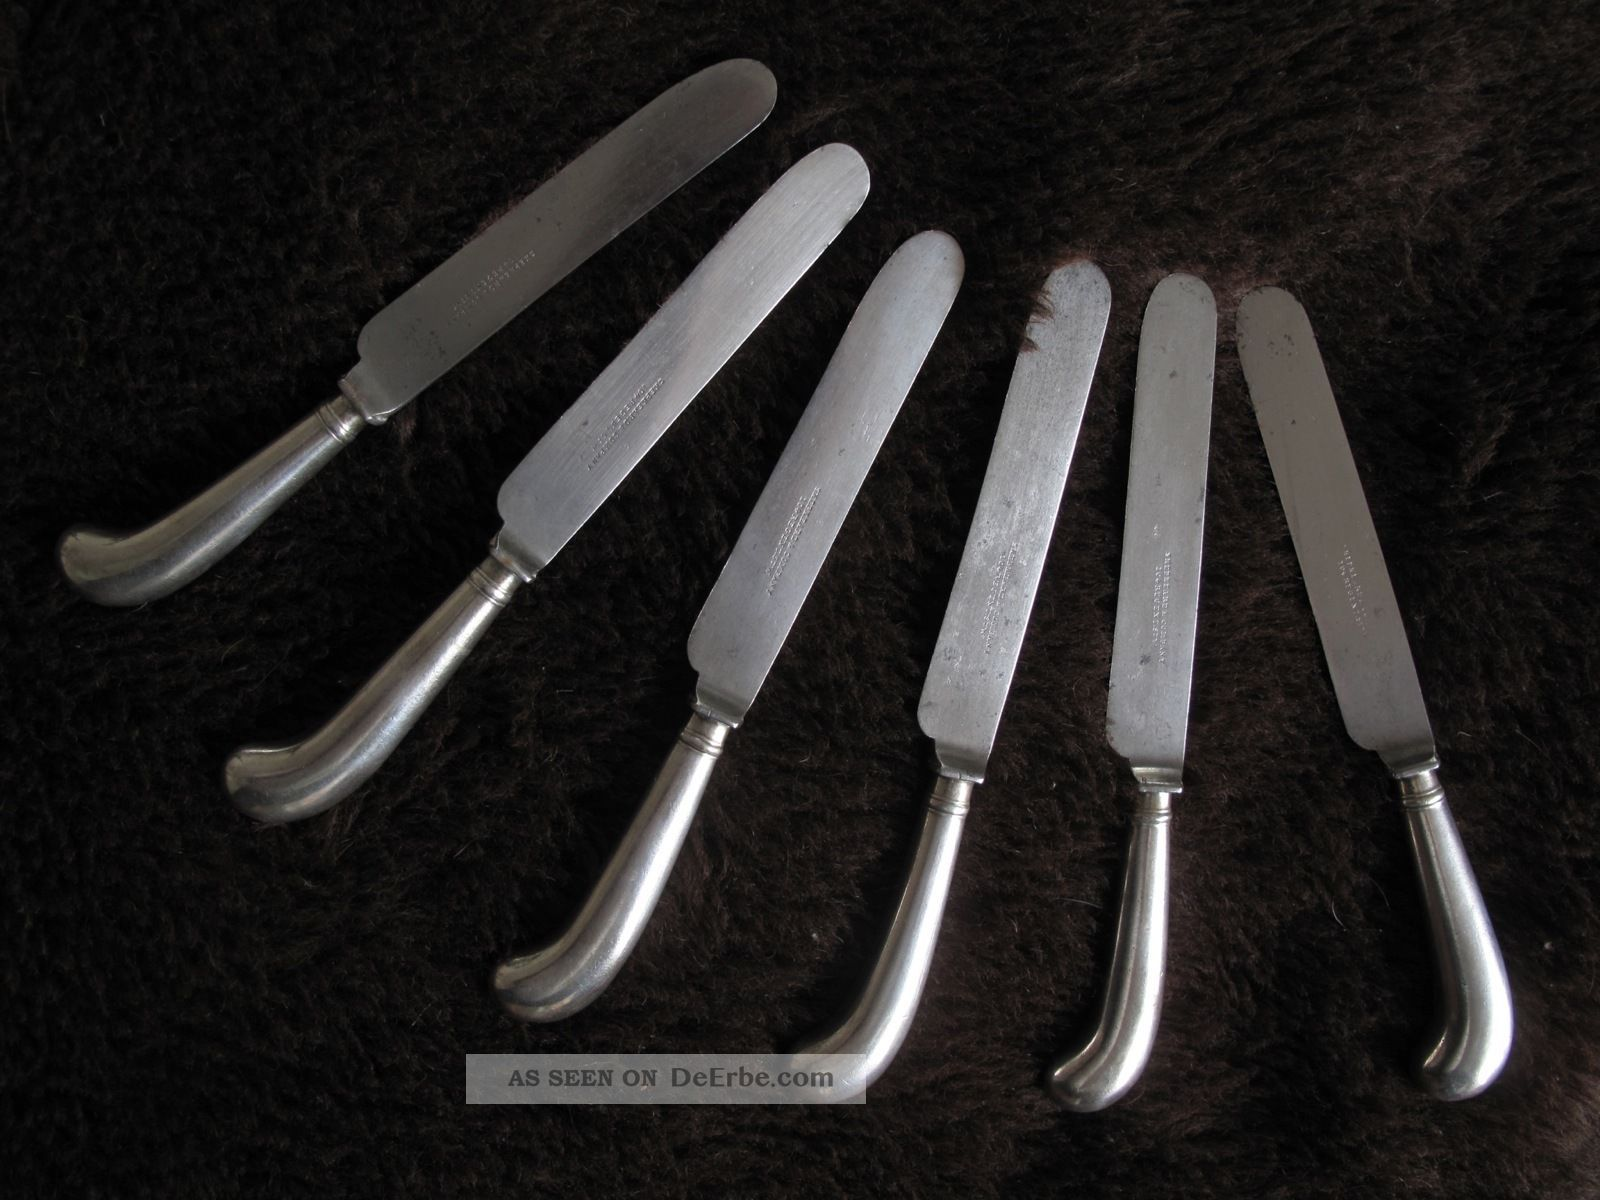 6 Messer Antik England Pistolengriff Versilbert Shepheard & Co 19.  Jahrhundert Objekte vor 1945 Bild